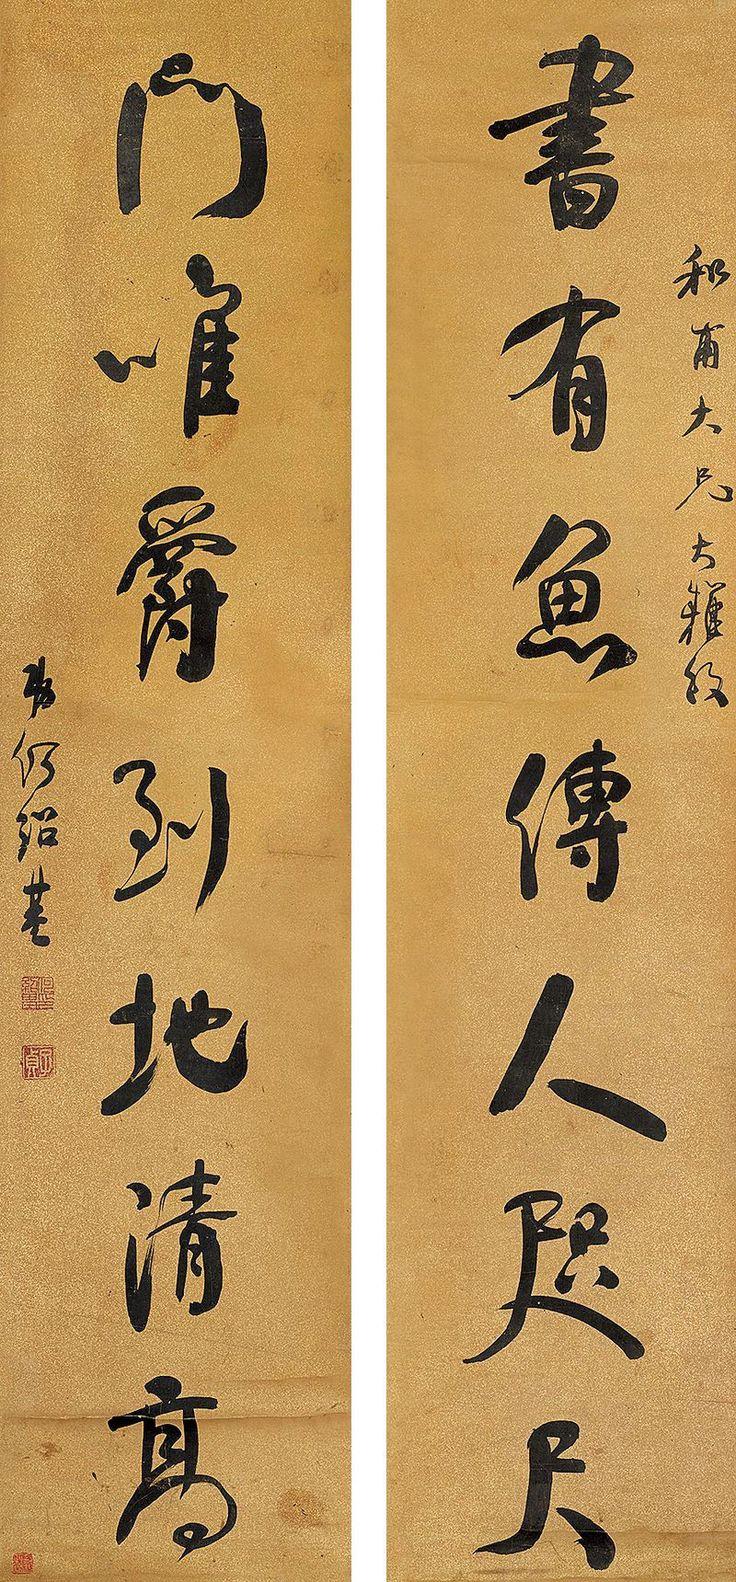 He Shaoji(b. 1799-1873) Seven-Character Couplet In Running Script. 何紹基(b. 1799-1873) 行書七言聯 立軸 水墨紙本  125 x 28 cm. 49 1/4 x 11 in. 約3.2平尺(每幅)  鈐印:何紹基印、子貞 題識:和甫大兄大雅教。弟何紹基。 藏印:阮祖煌印 釋文:書有魚傳人咫尺,門唯爵到地清高。